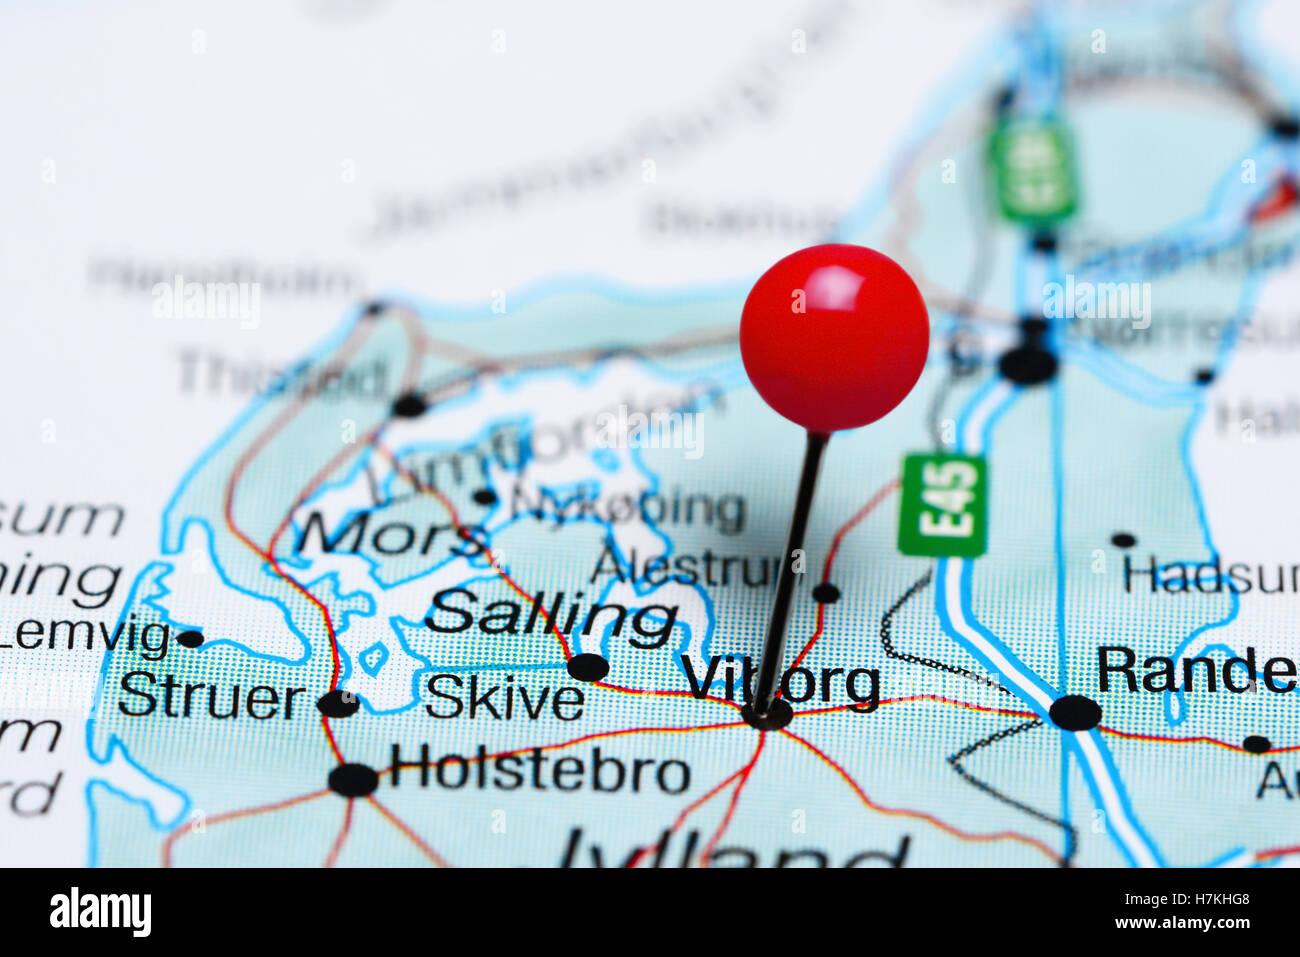 Map Pin Denmark Stock Photos & Map Pin Denmark Stock Images - Alamy